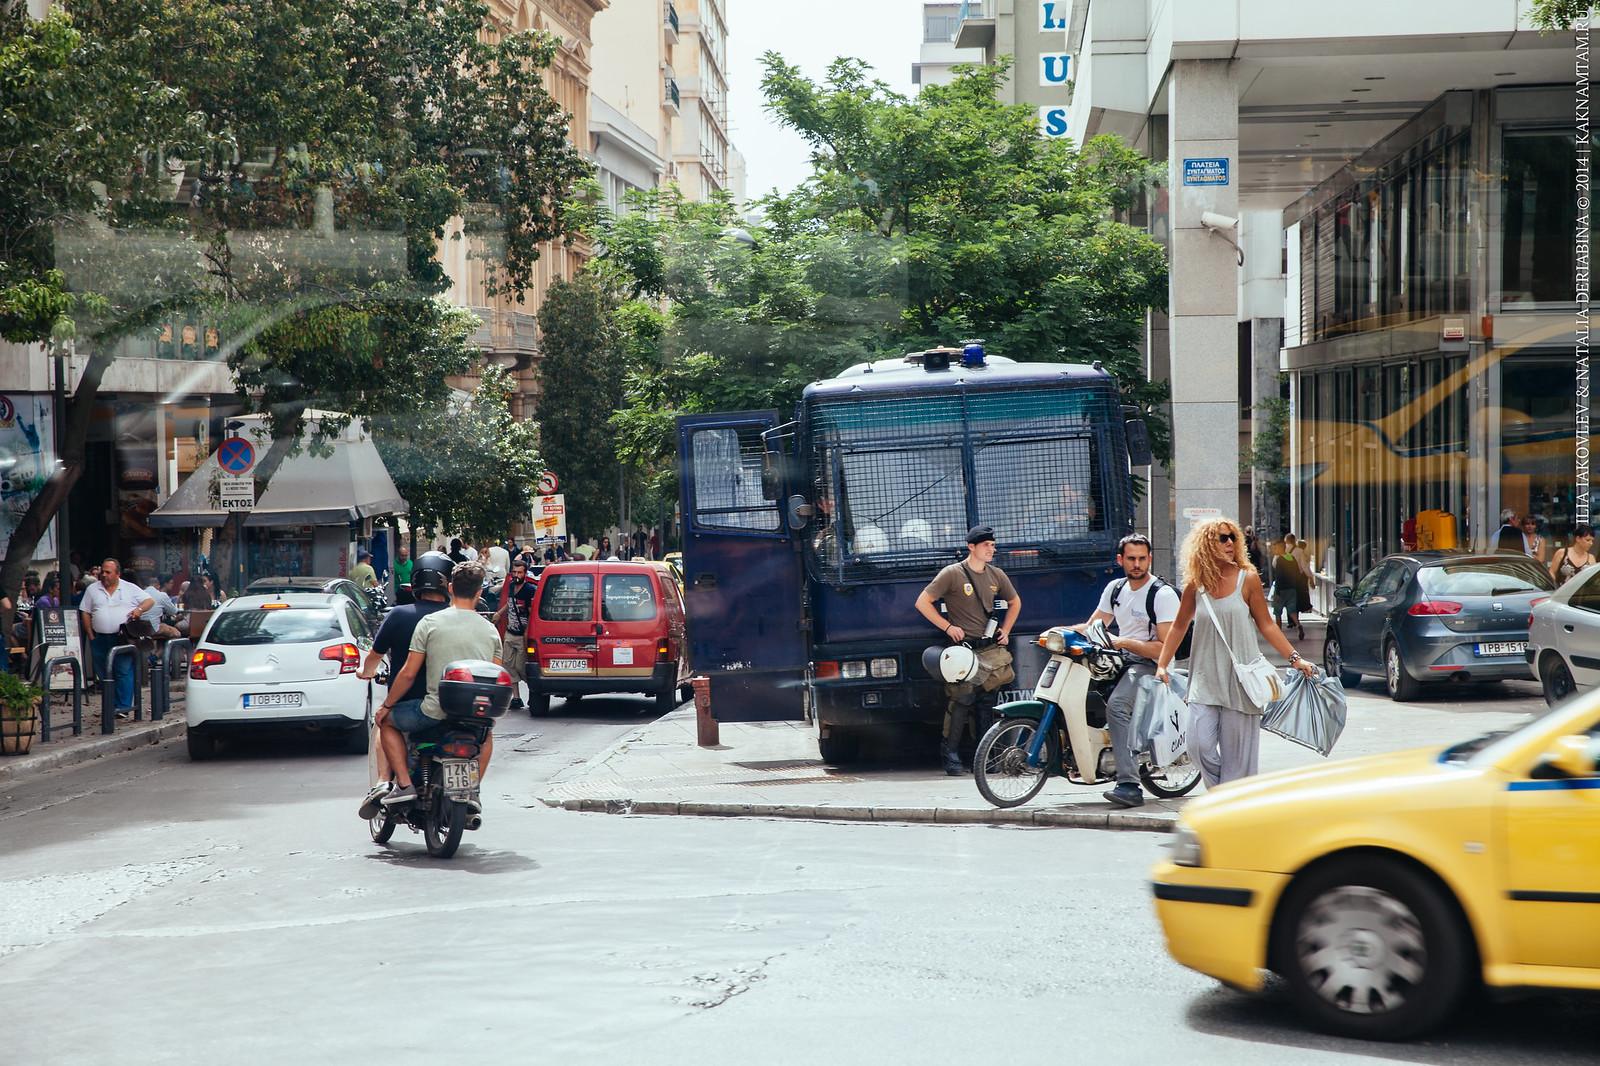 20140618-011-Athens.jpg